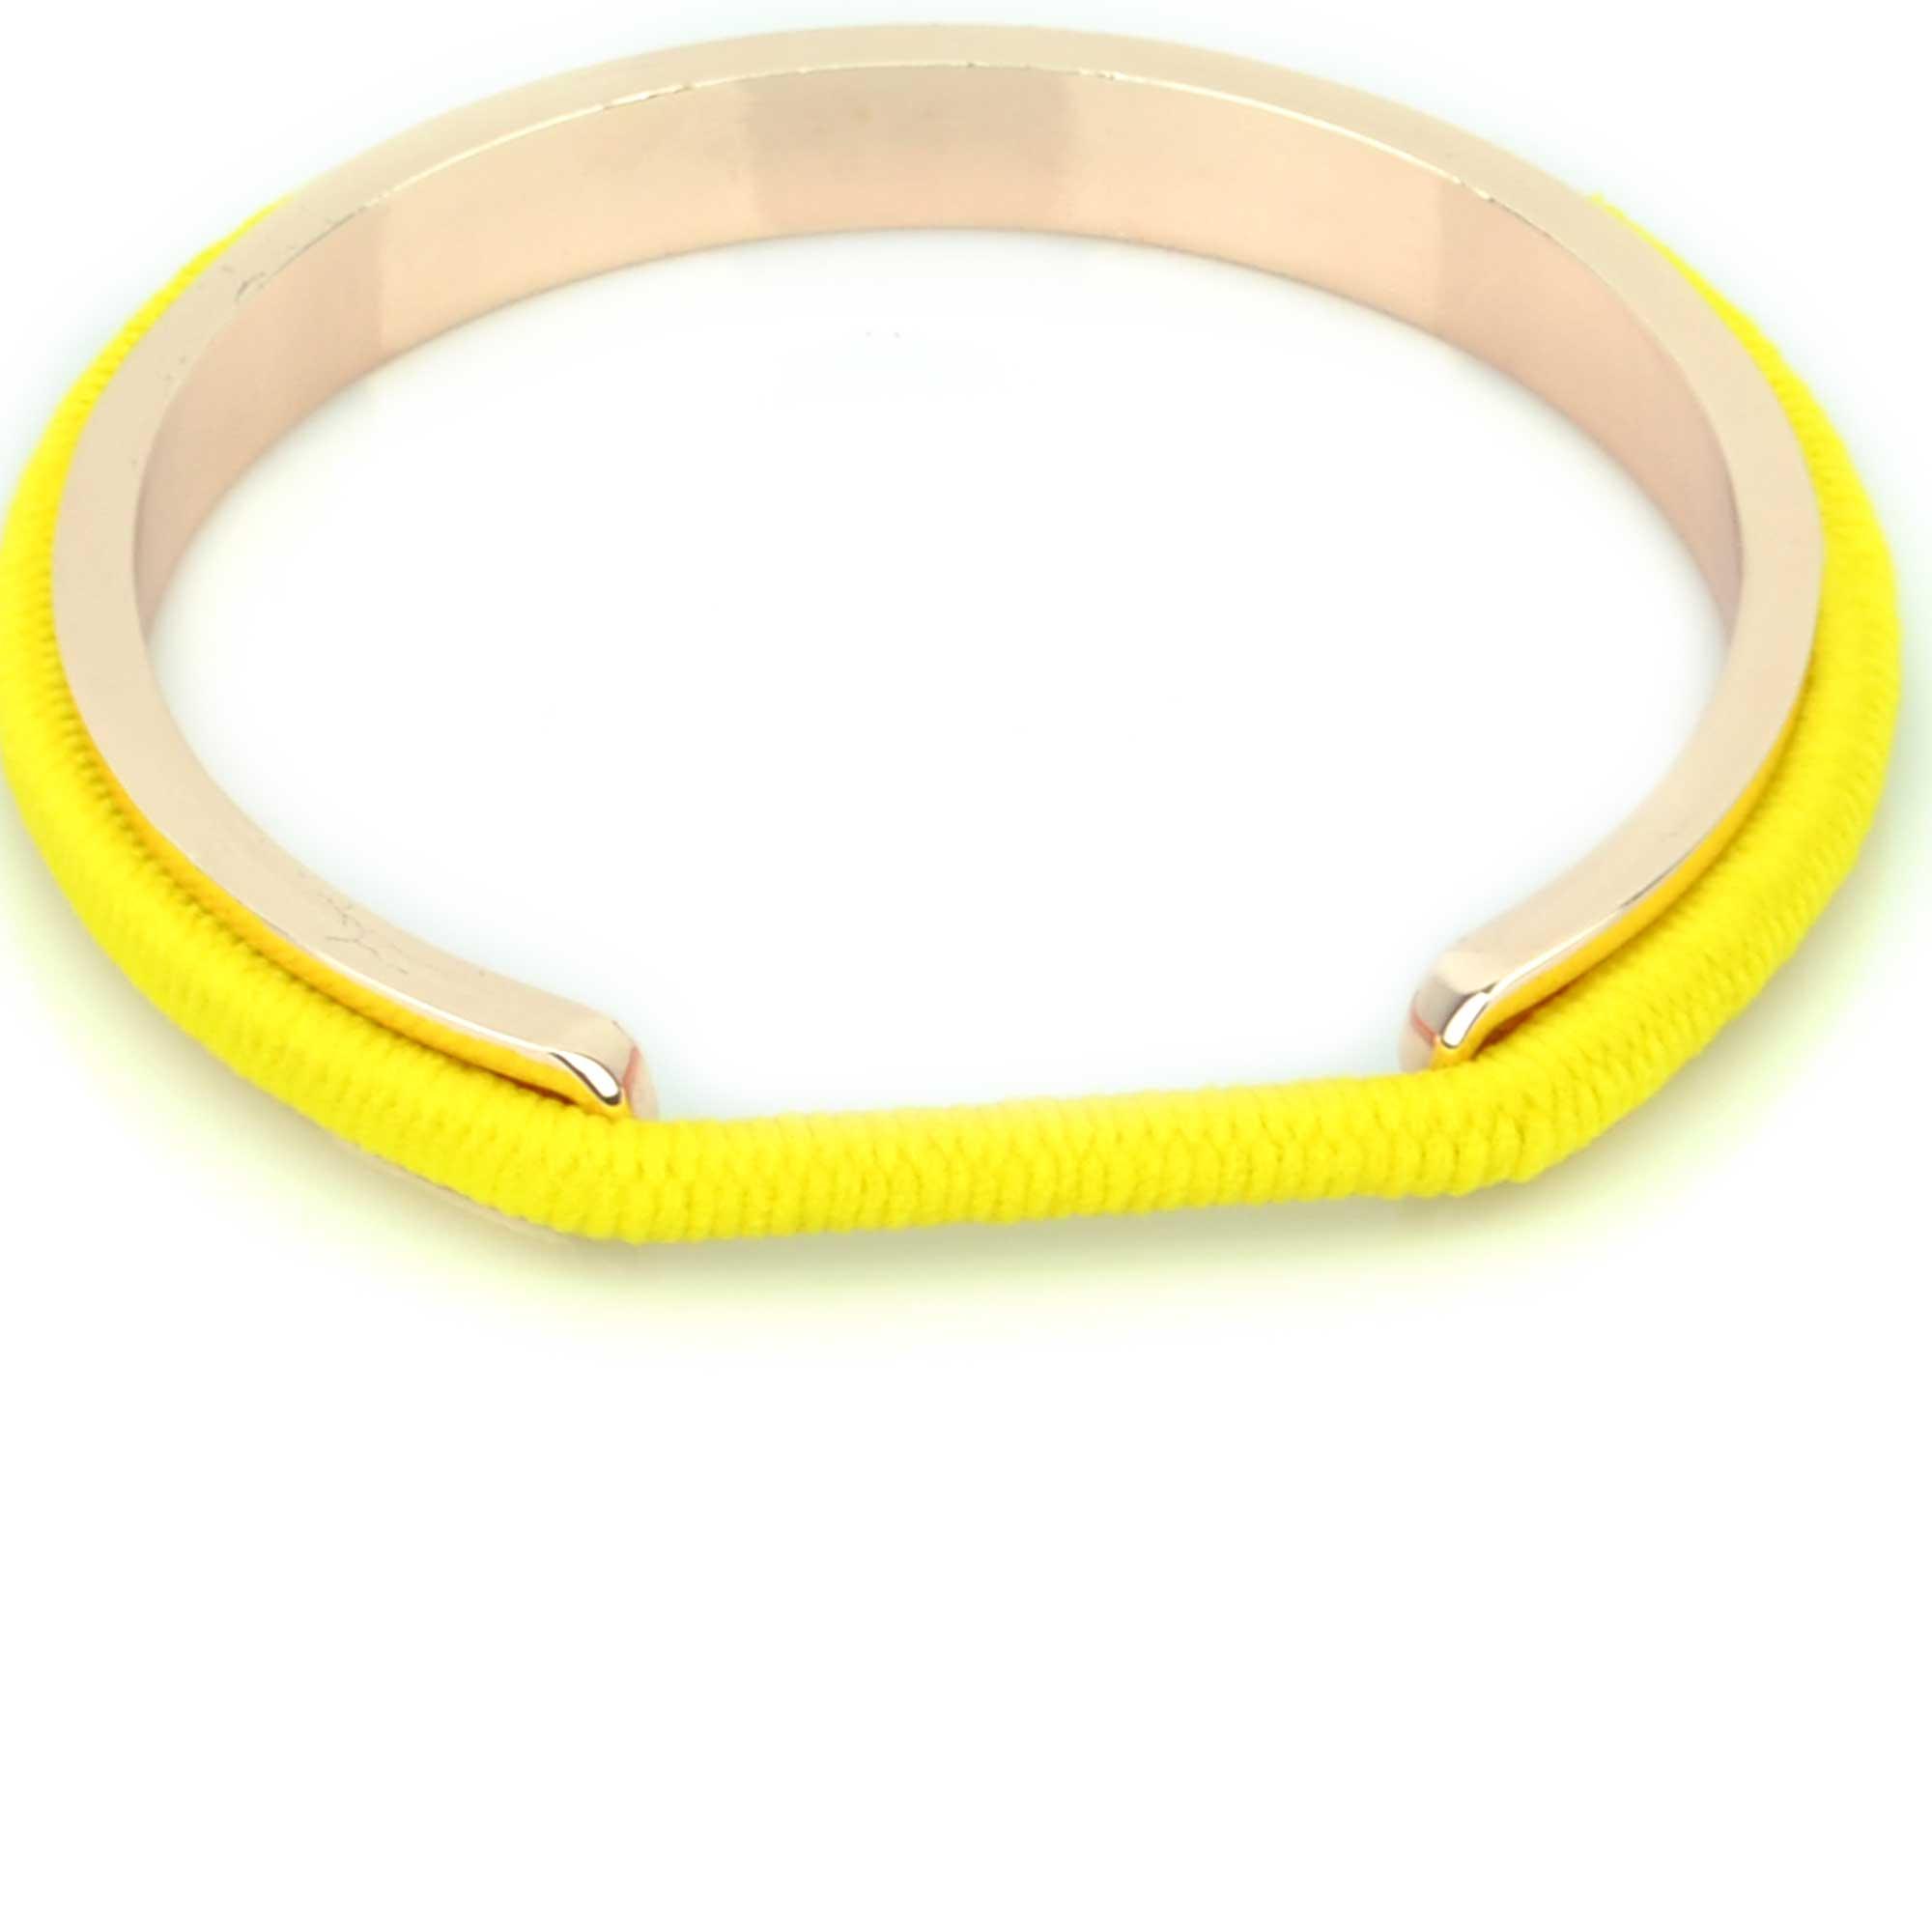 hair tie bangle bracelet photo - 1